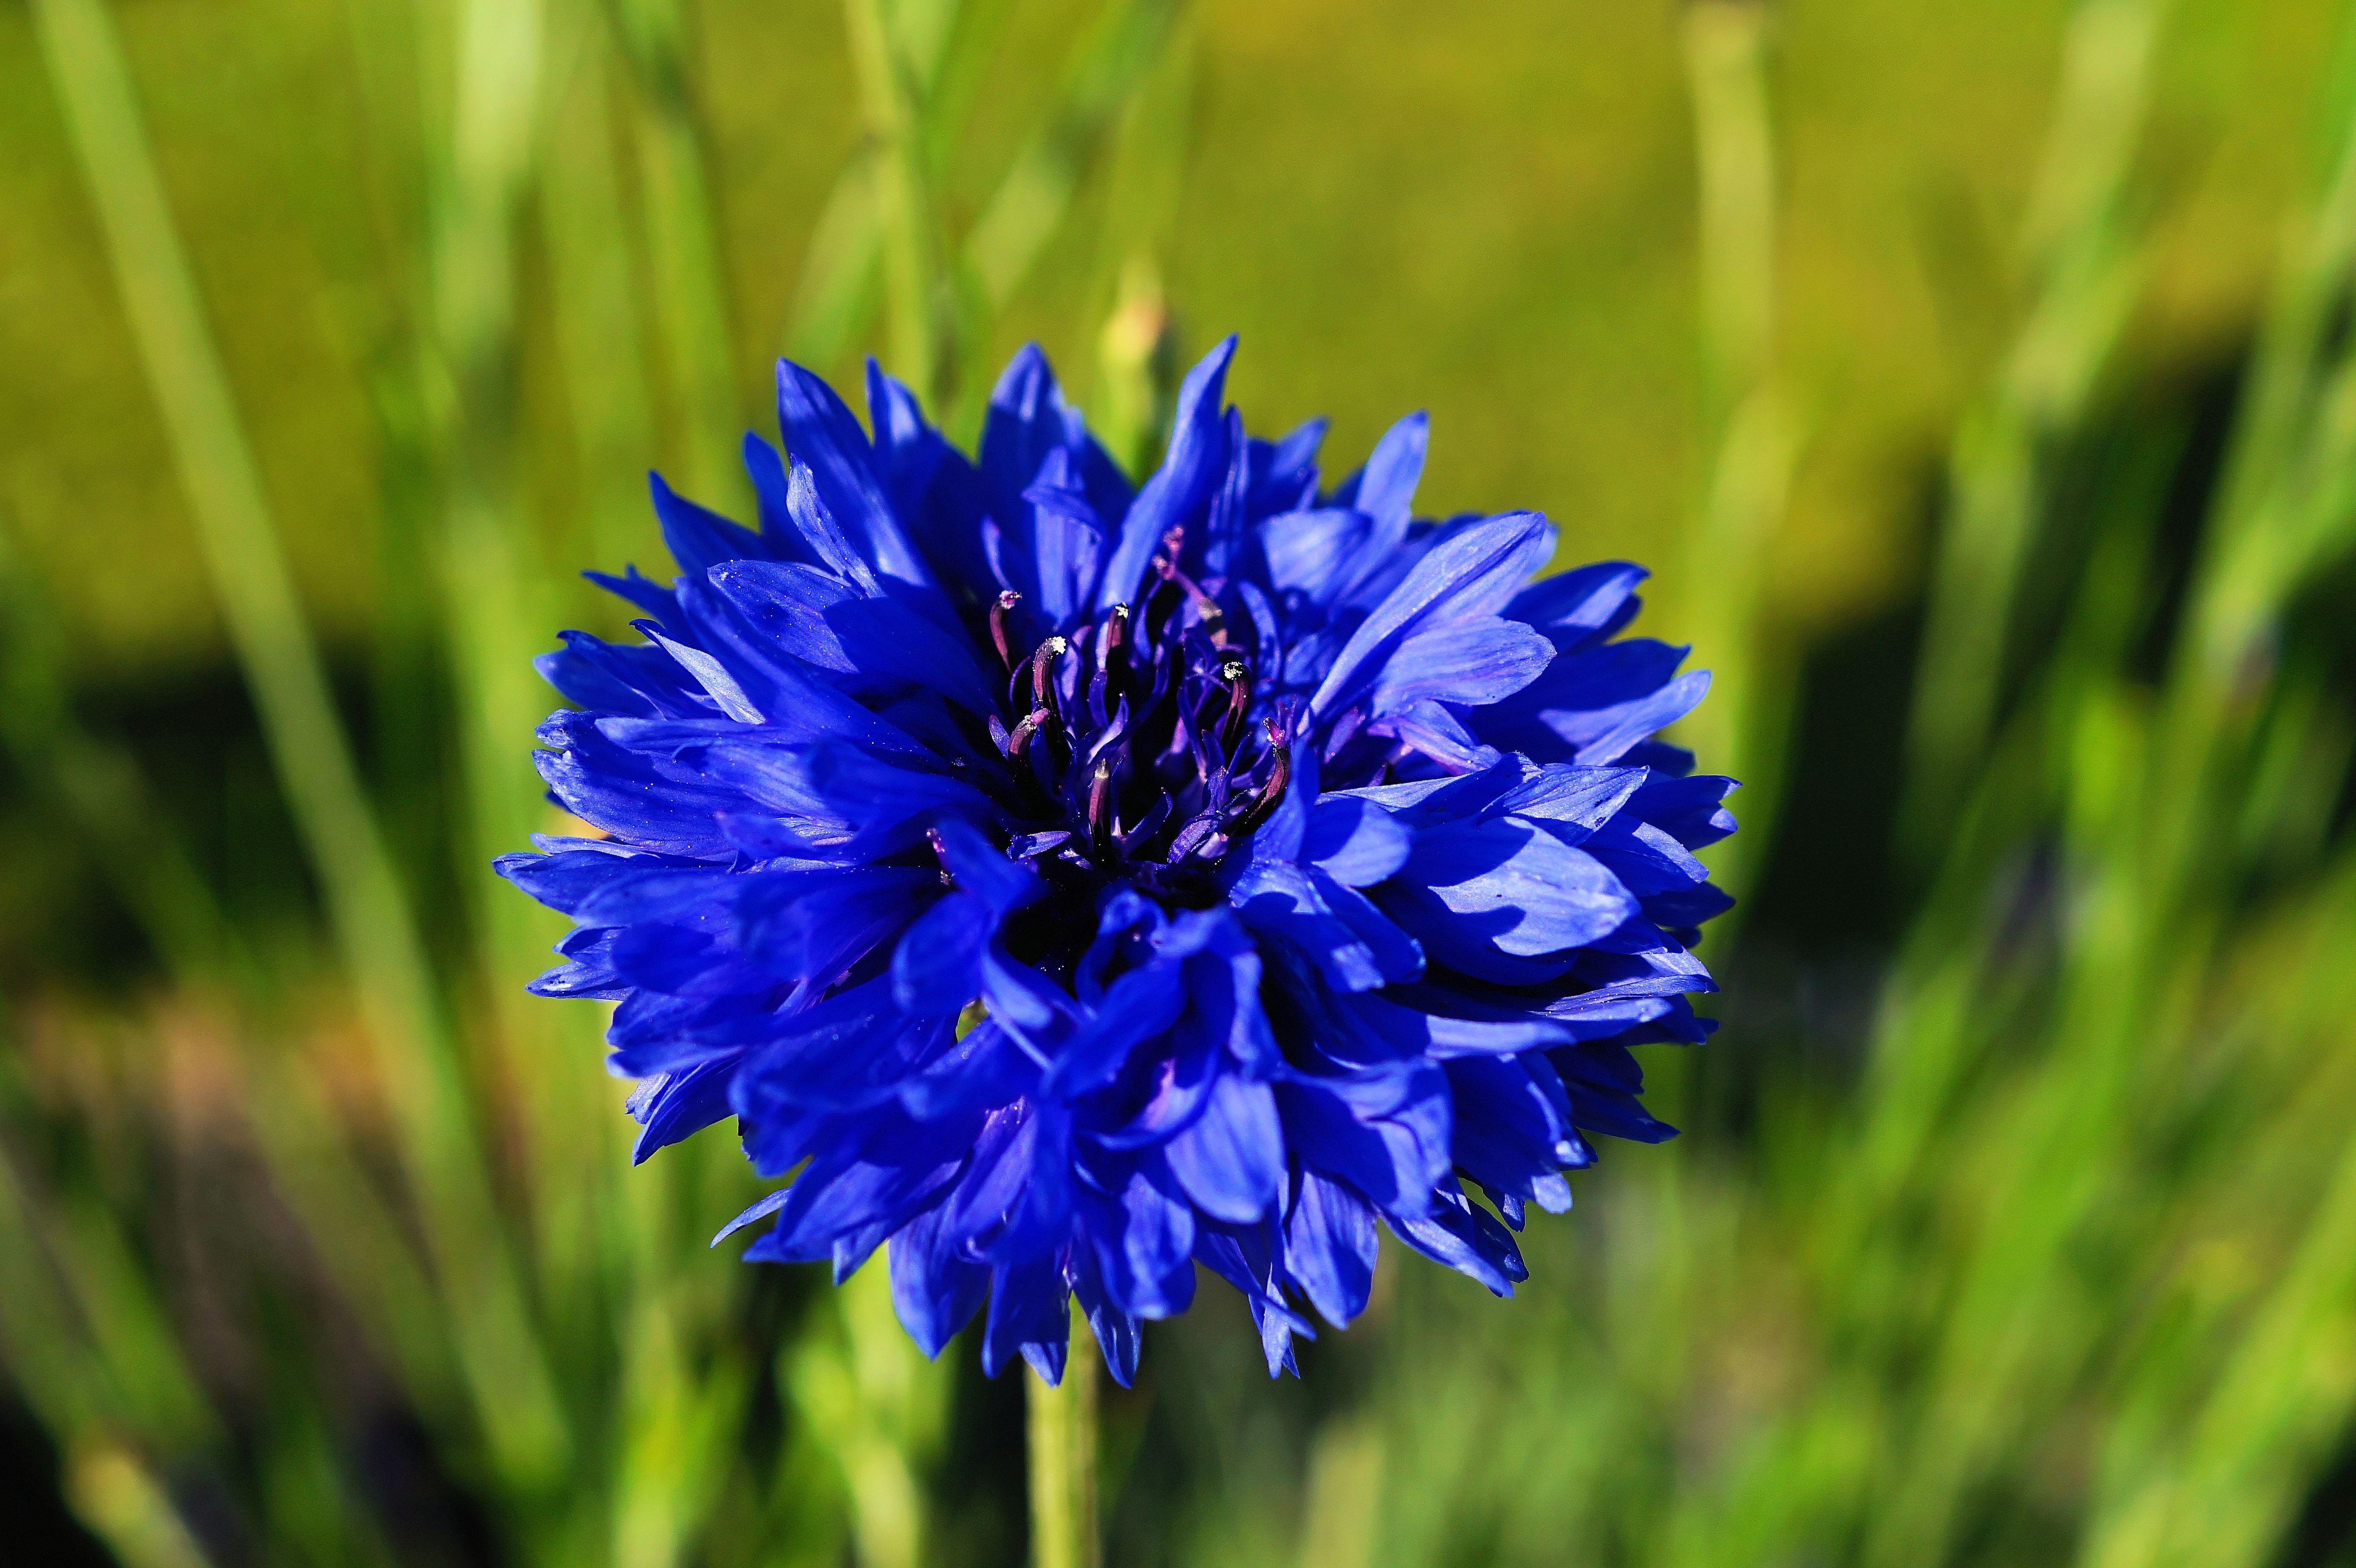 https://get.pxhere.com/photo/nature-grass-blossom-plant-field-meadow-prairie-flower-bloom-herb-produce-vegetable-botany-blue-close-flora-wildflower-centaurea-cyanus-cornflower-macro-photography-flowering-plant-plant-stem-land-plant-1100682.jpg